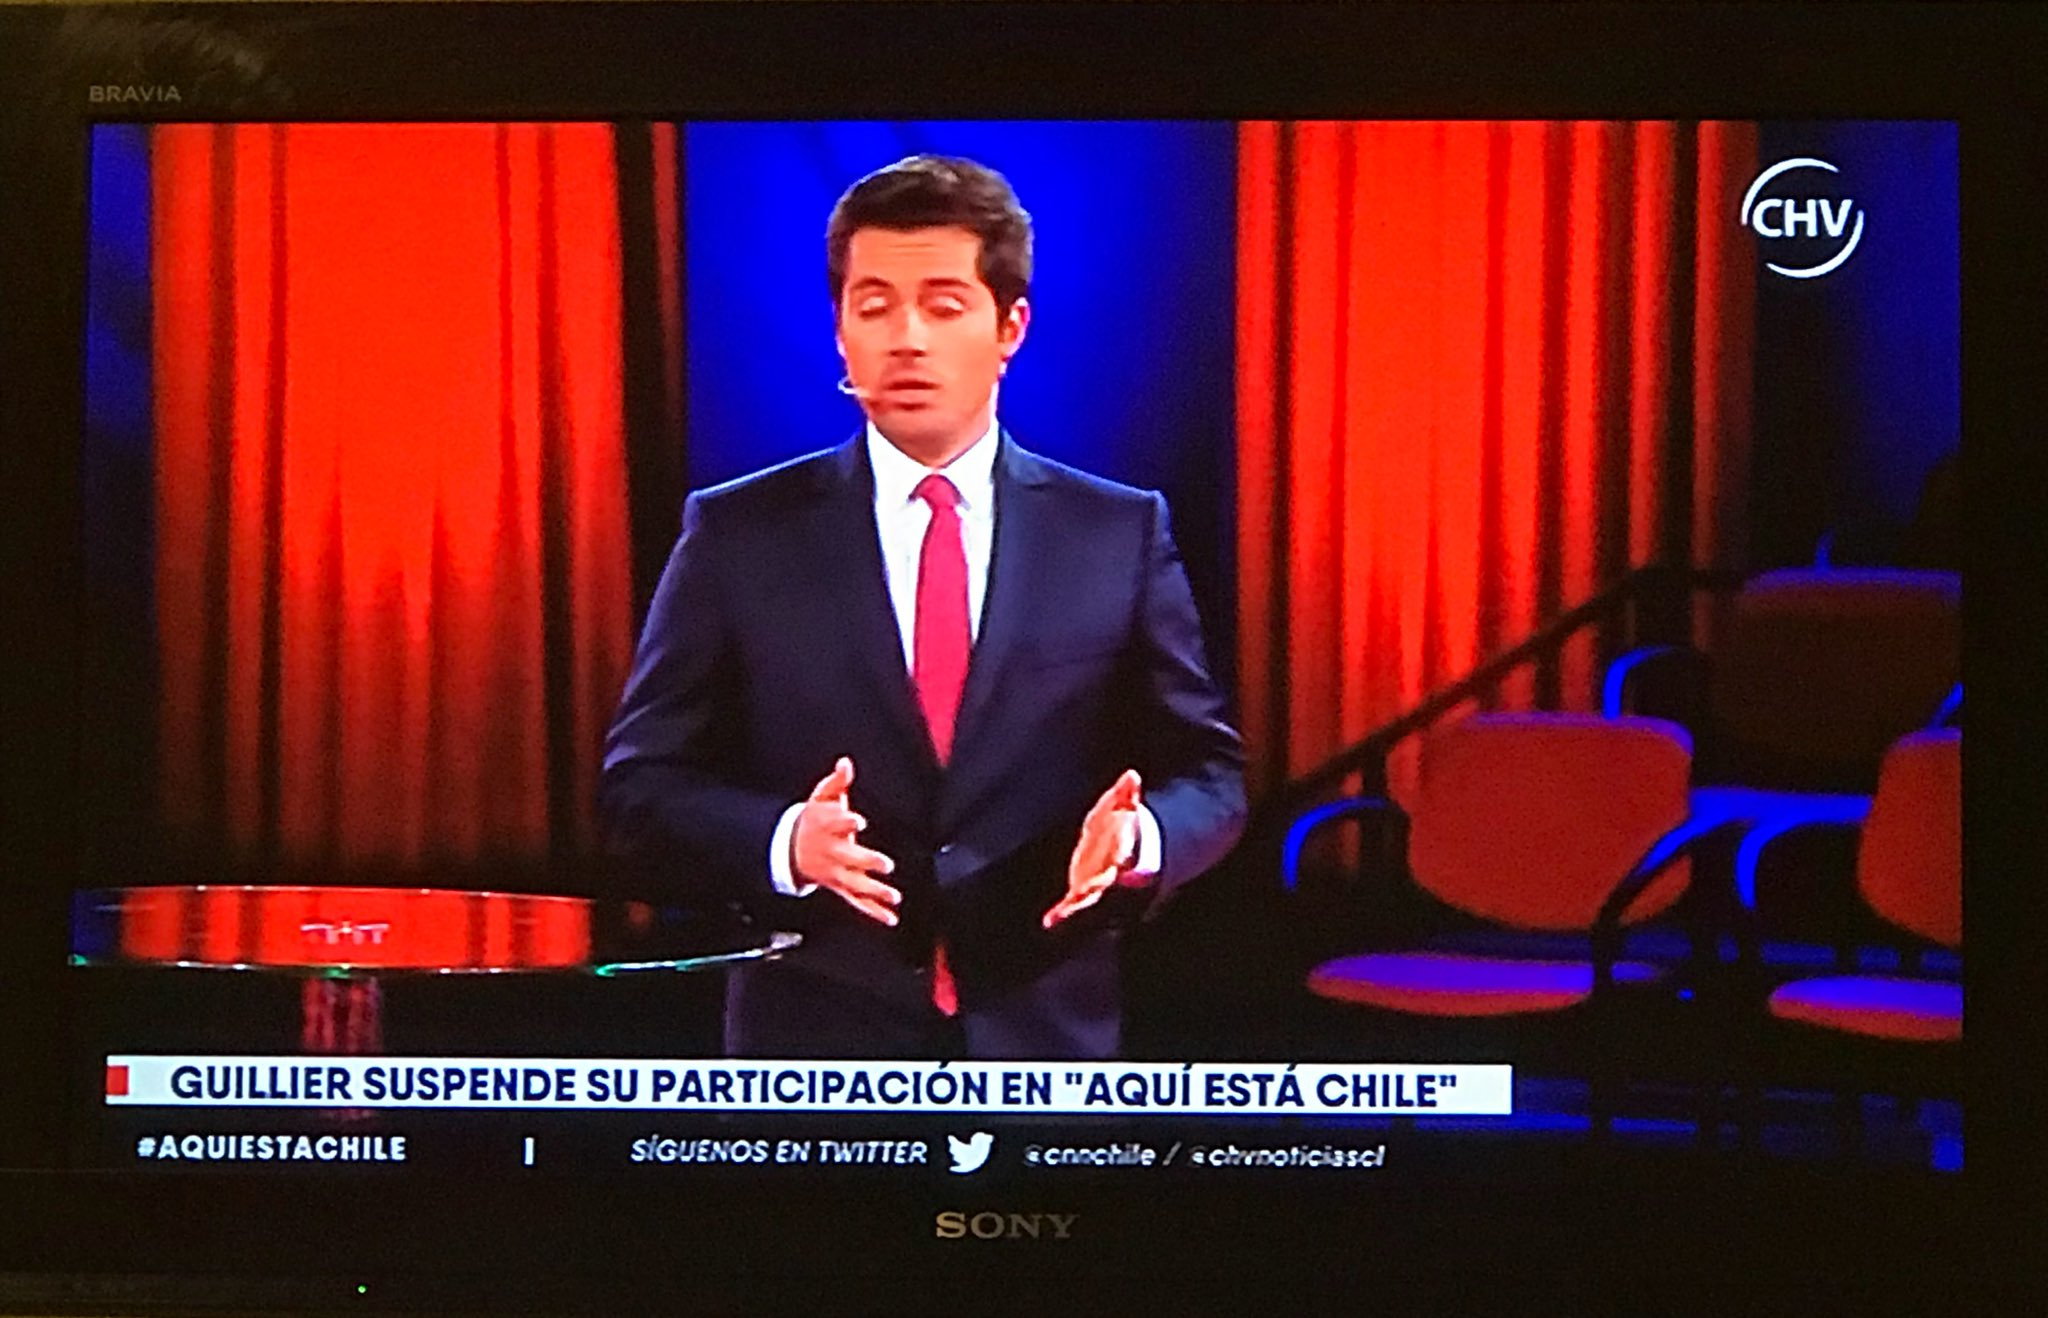 UNA VERGÜENZA GUILLIER #AquíEstáChile https://t.co/WWV2MUKCDZ